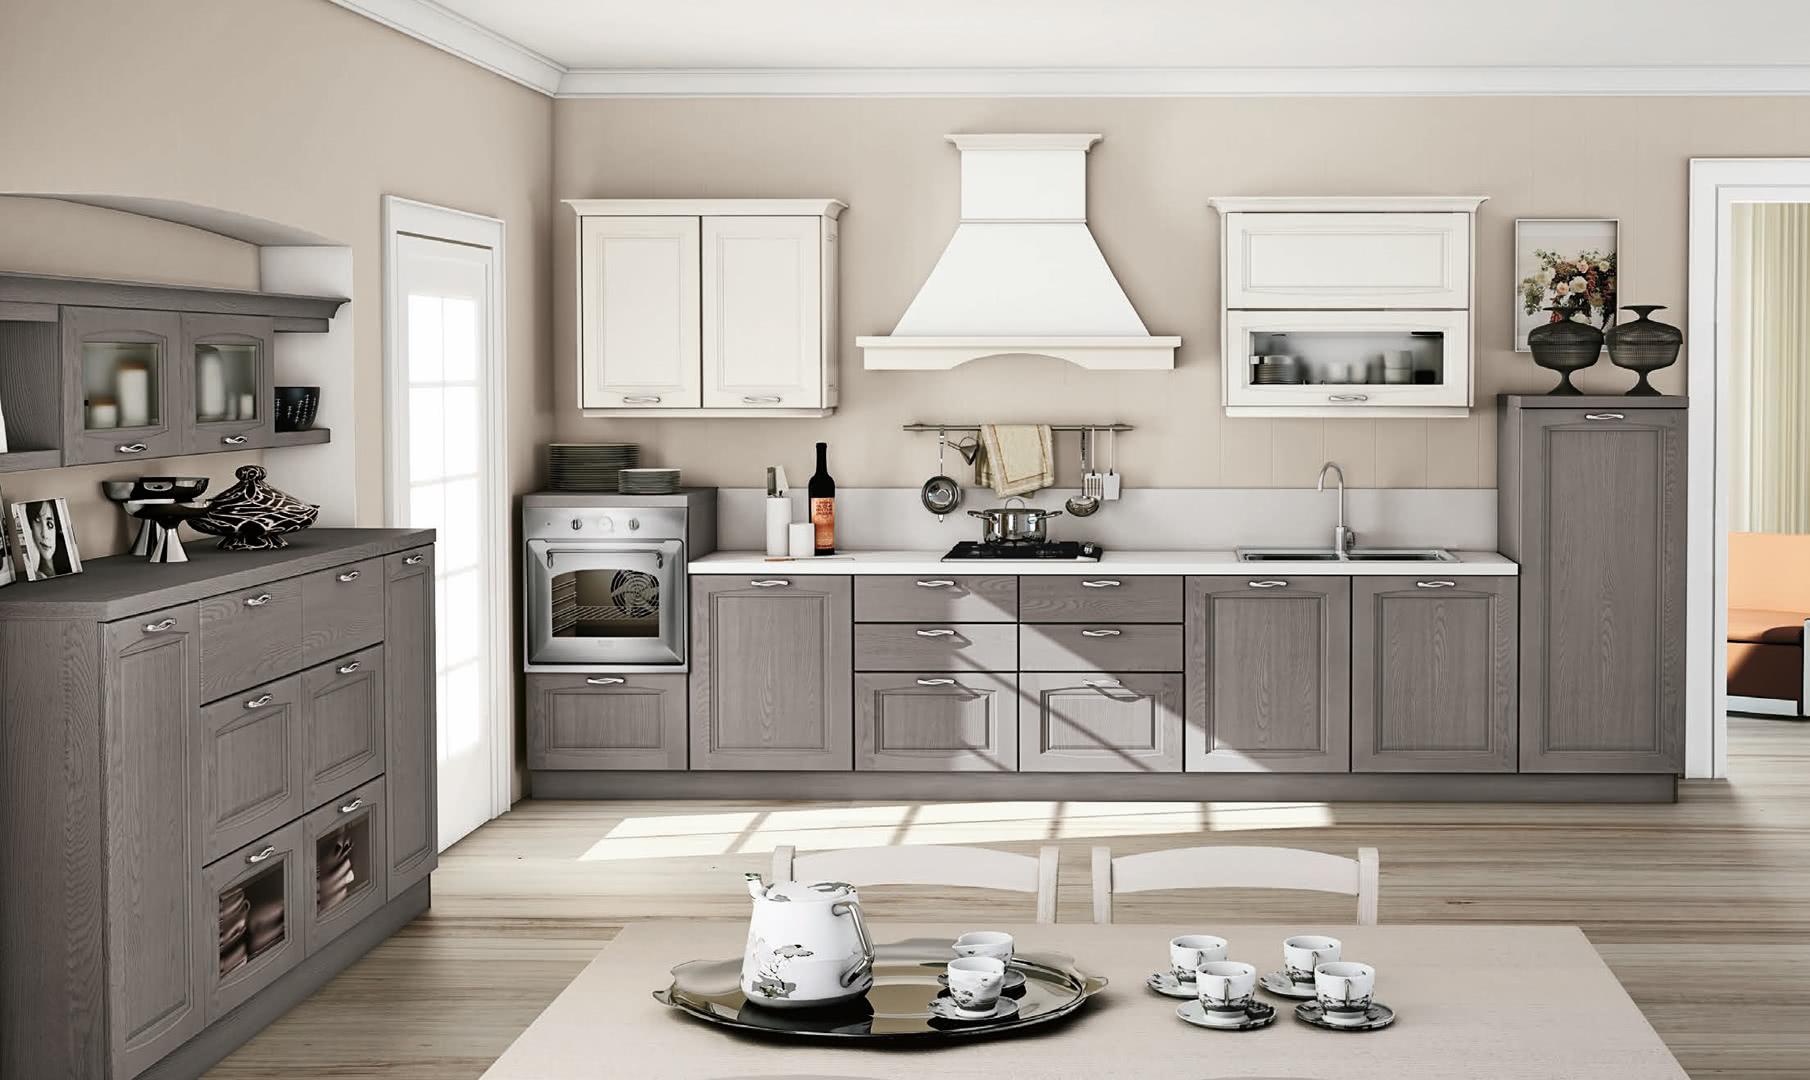 1419_raila-cucina-ambientata-2